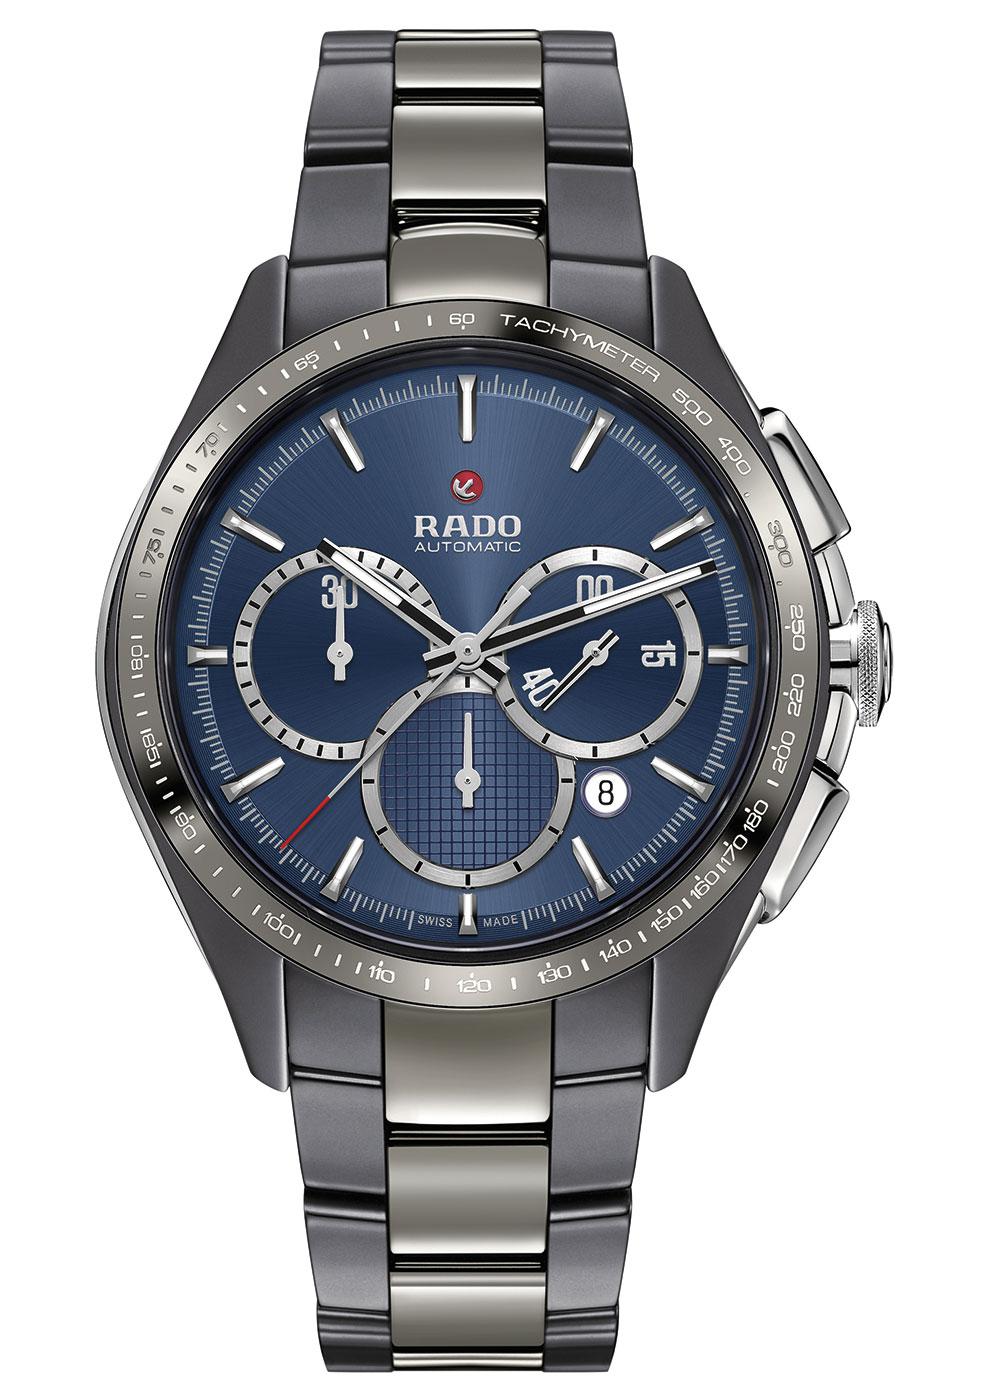 baselworld-2017-preview-rado-hyperchrome-match-point-chronograph-einstieg-01